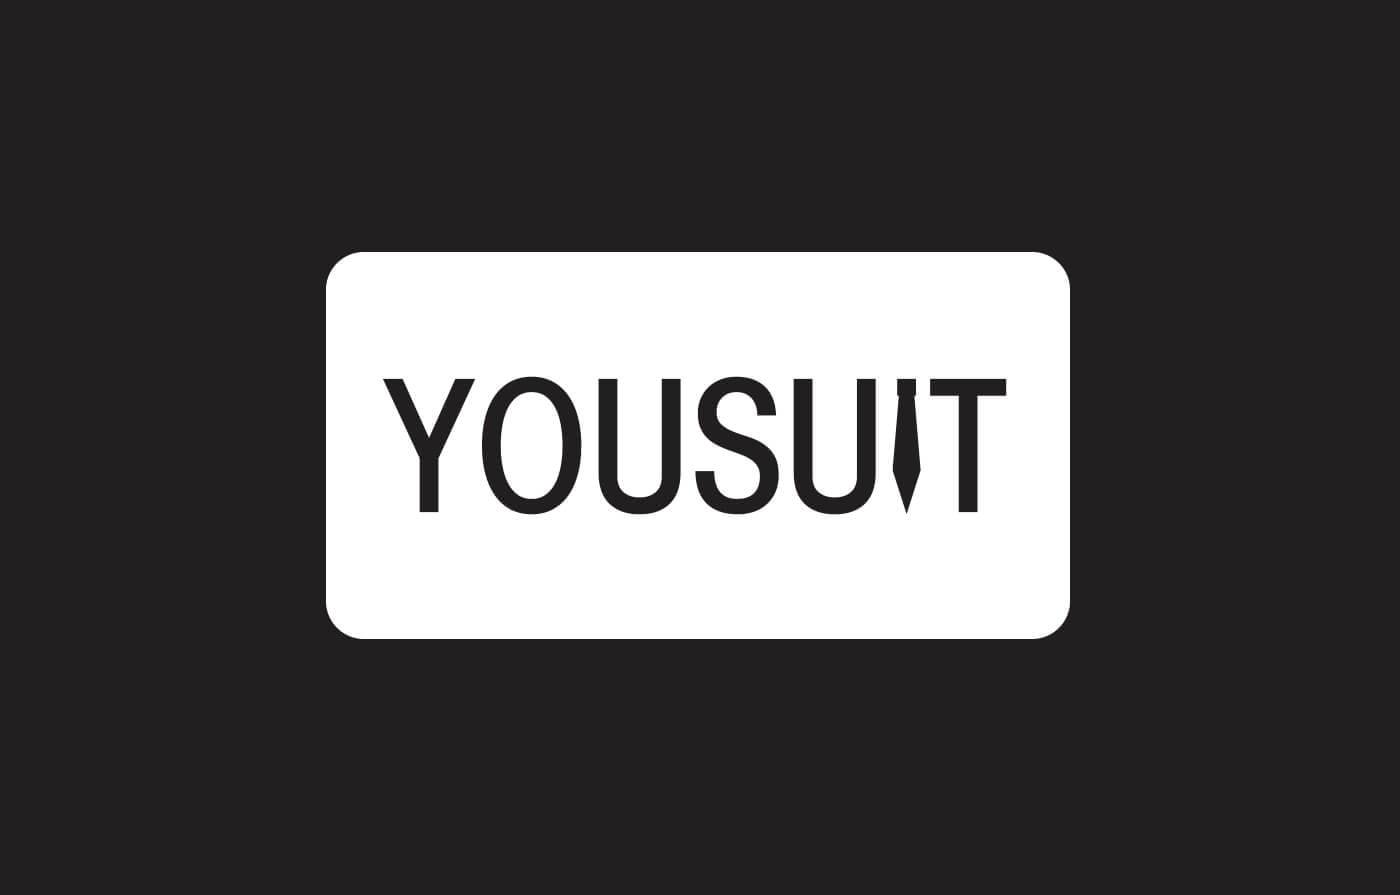 2010 YouSuit logo